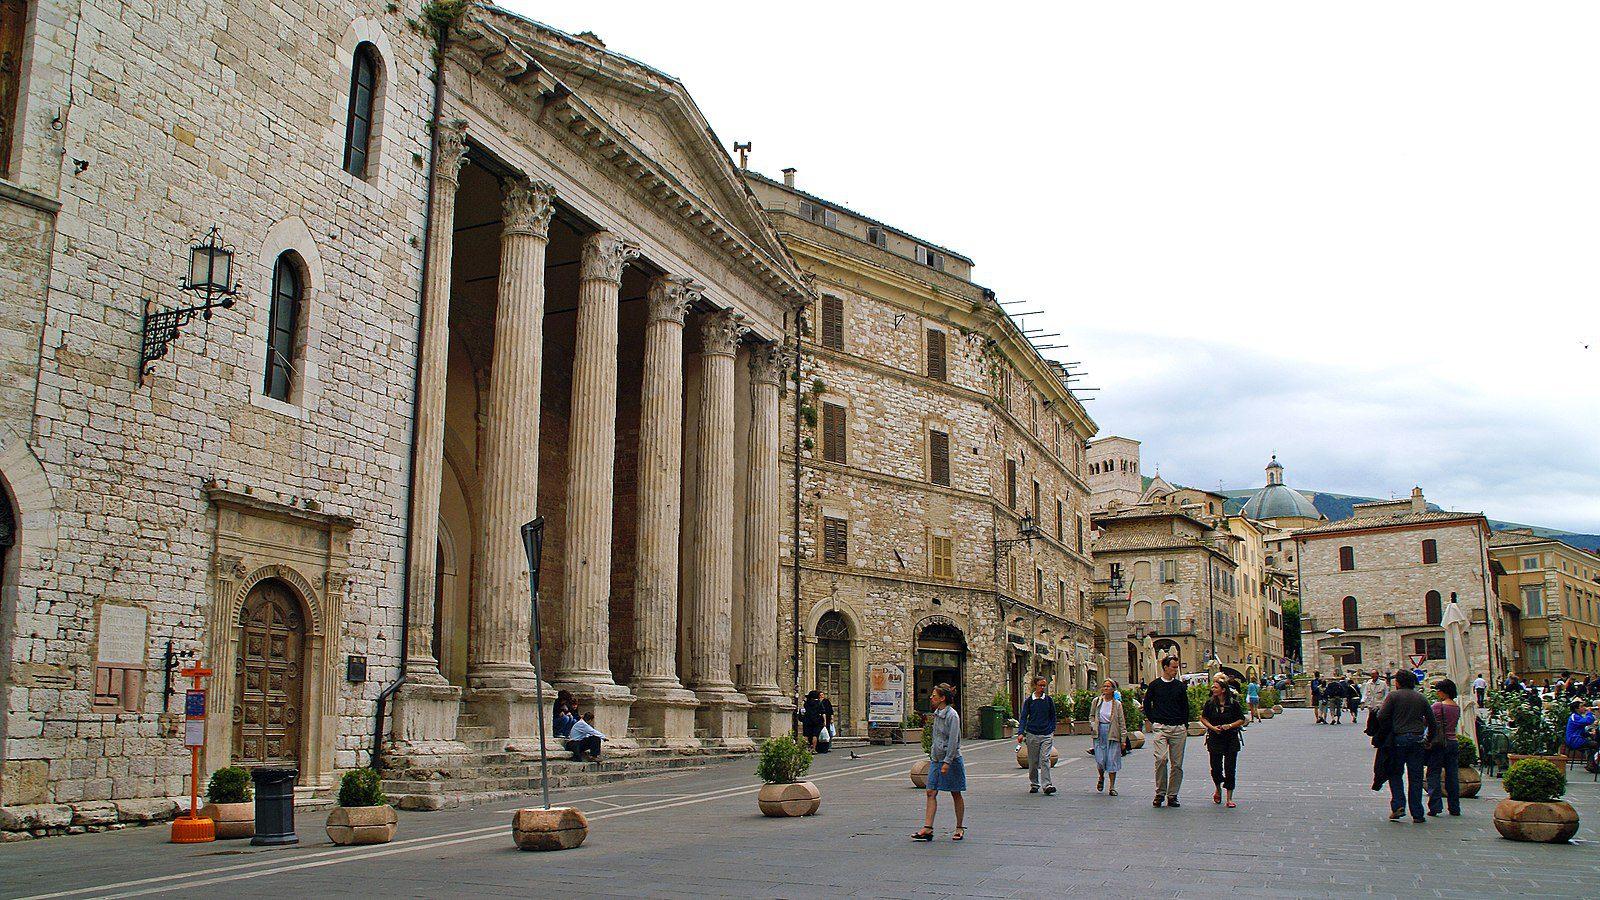 1600px-Temple_of_Minerva,_Piazza_del_Comune,_Assisi_-_panoramio